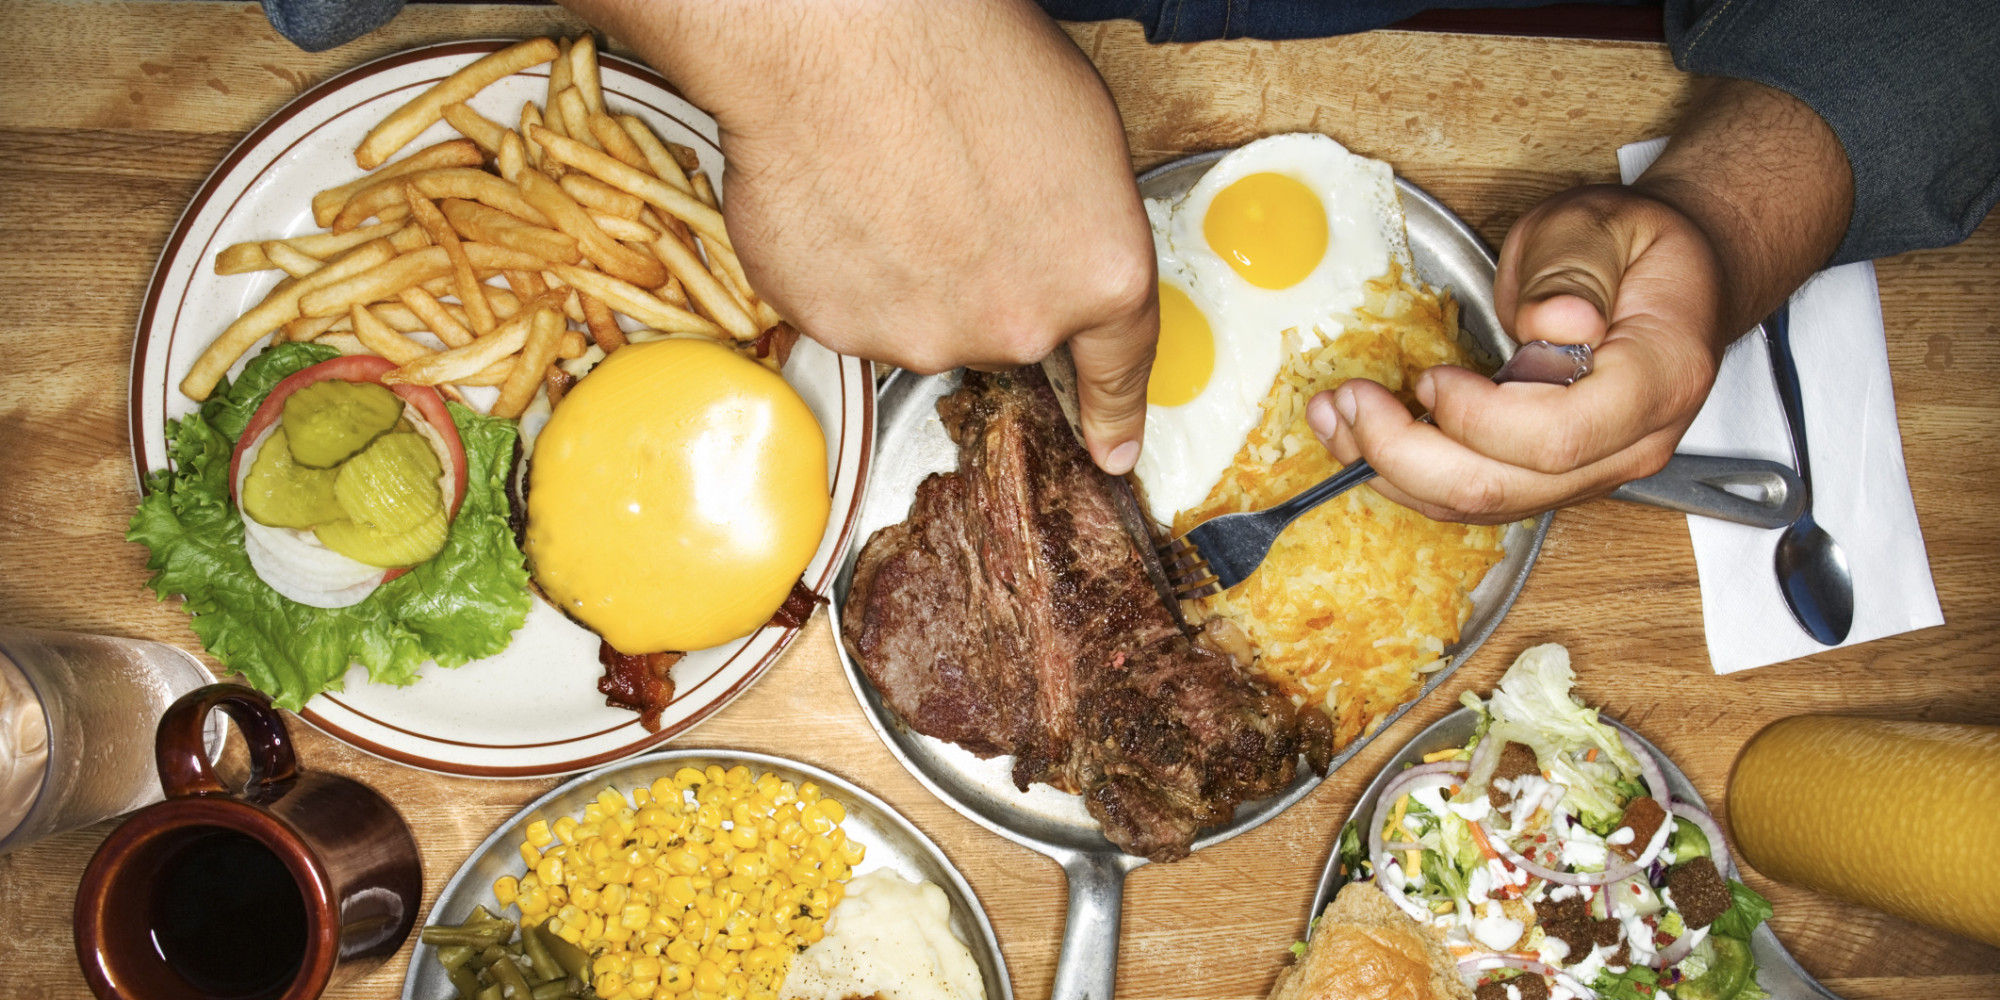 Food Addiction Vs Eating Addiction Why A Single Word